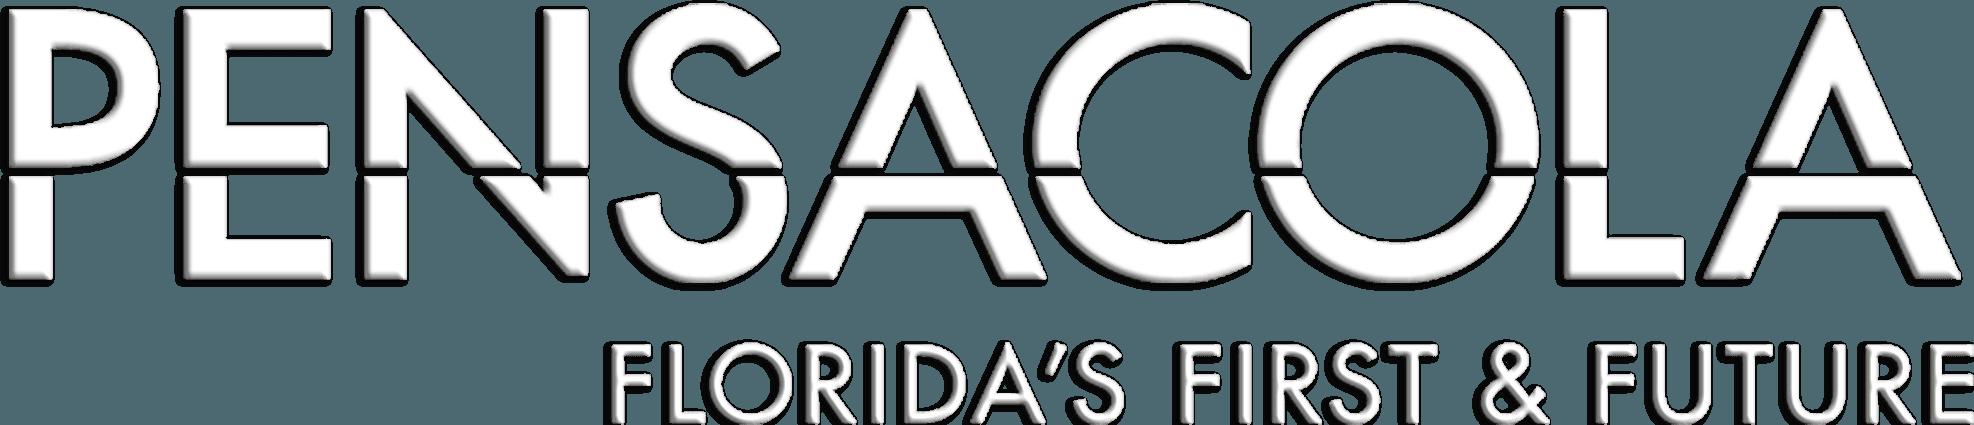 Pensacola Bay Ferry System | City of Pensacola, Florida Official Website